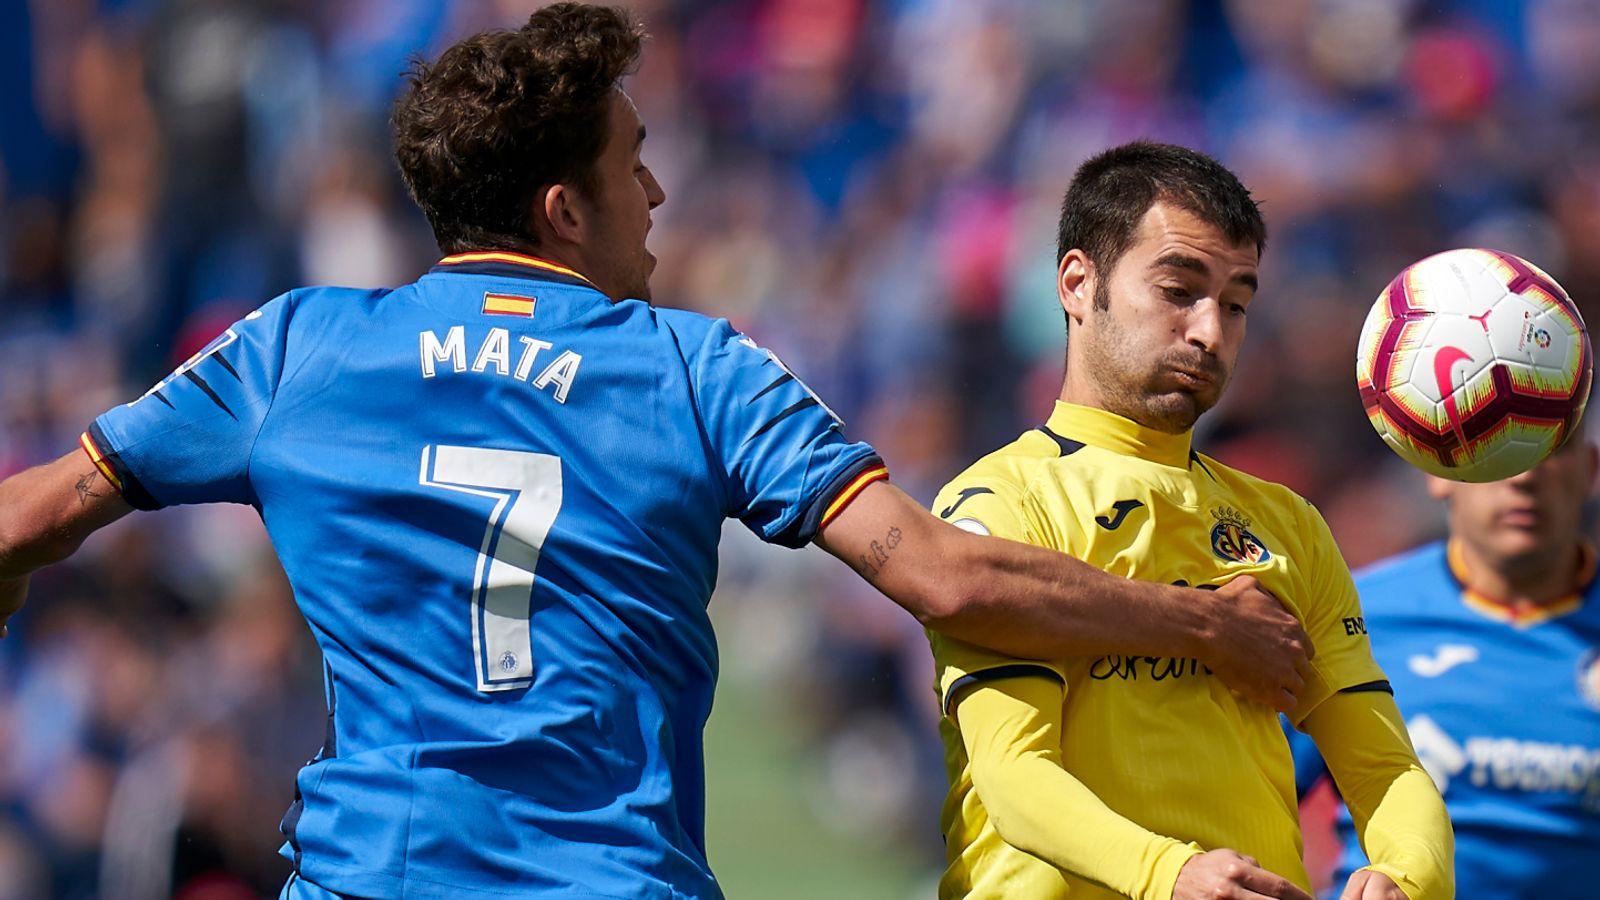 Villarreal and Getafe deny match-fixing claims over La Liga draw last season | Football News 9